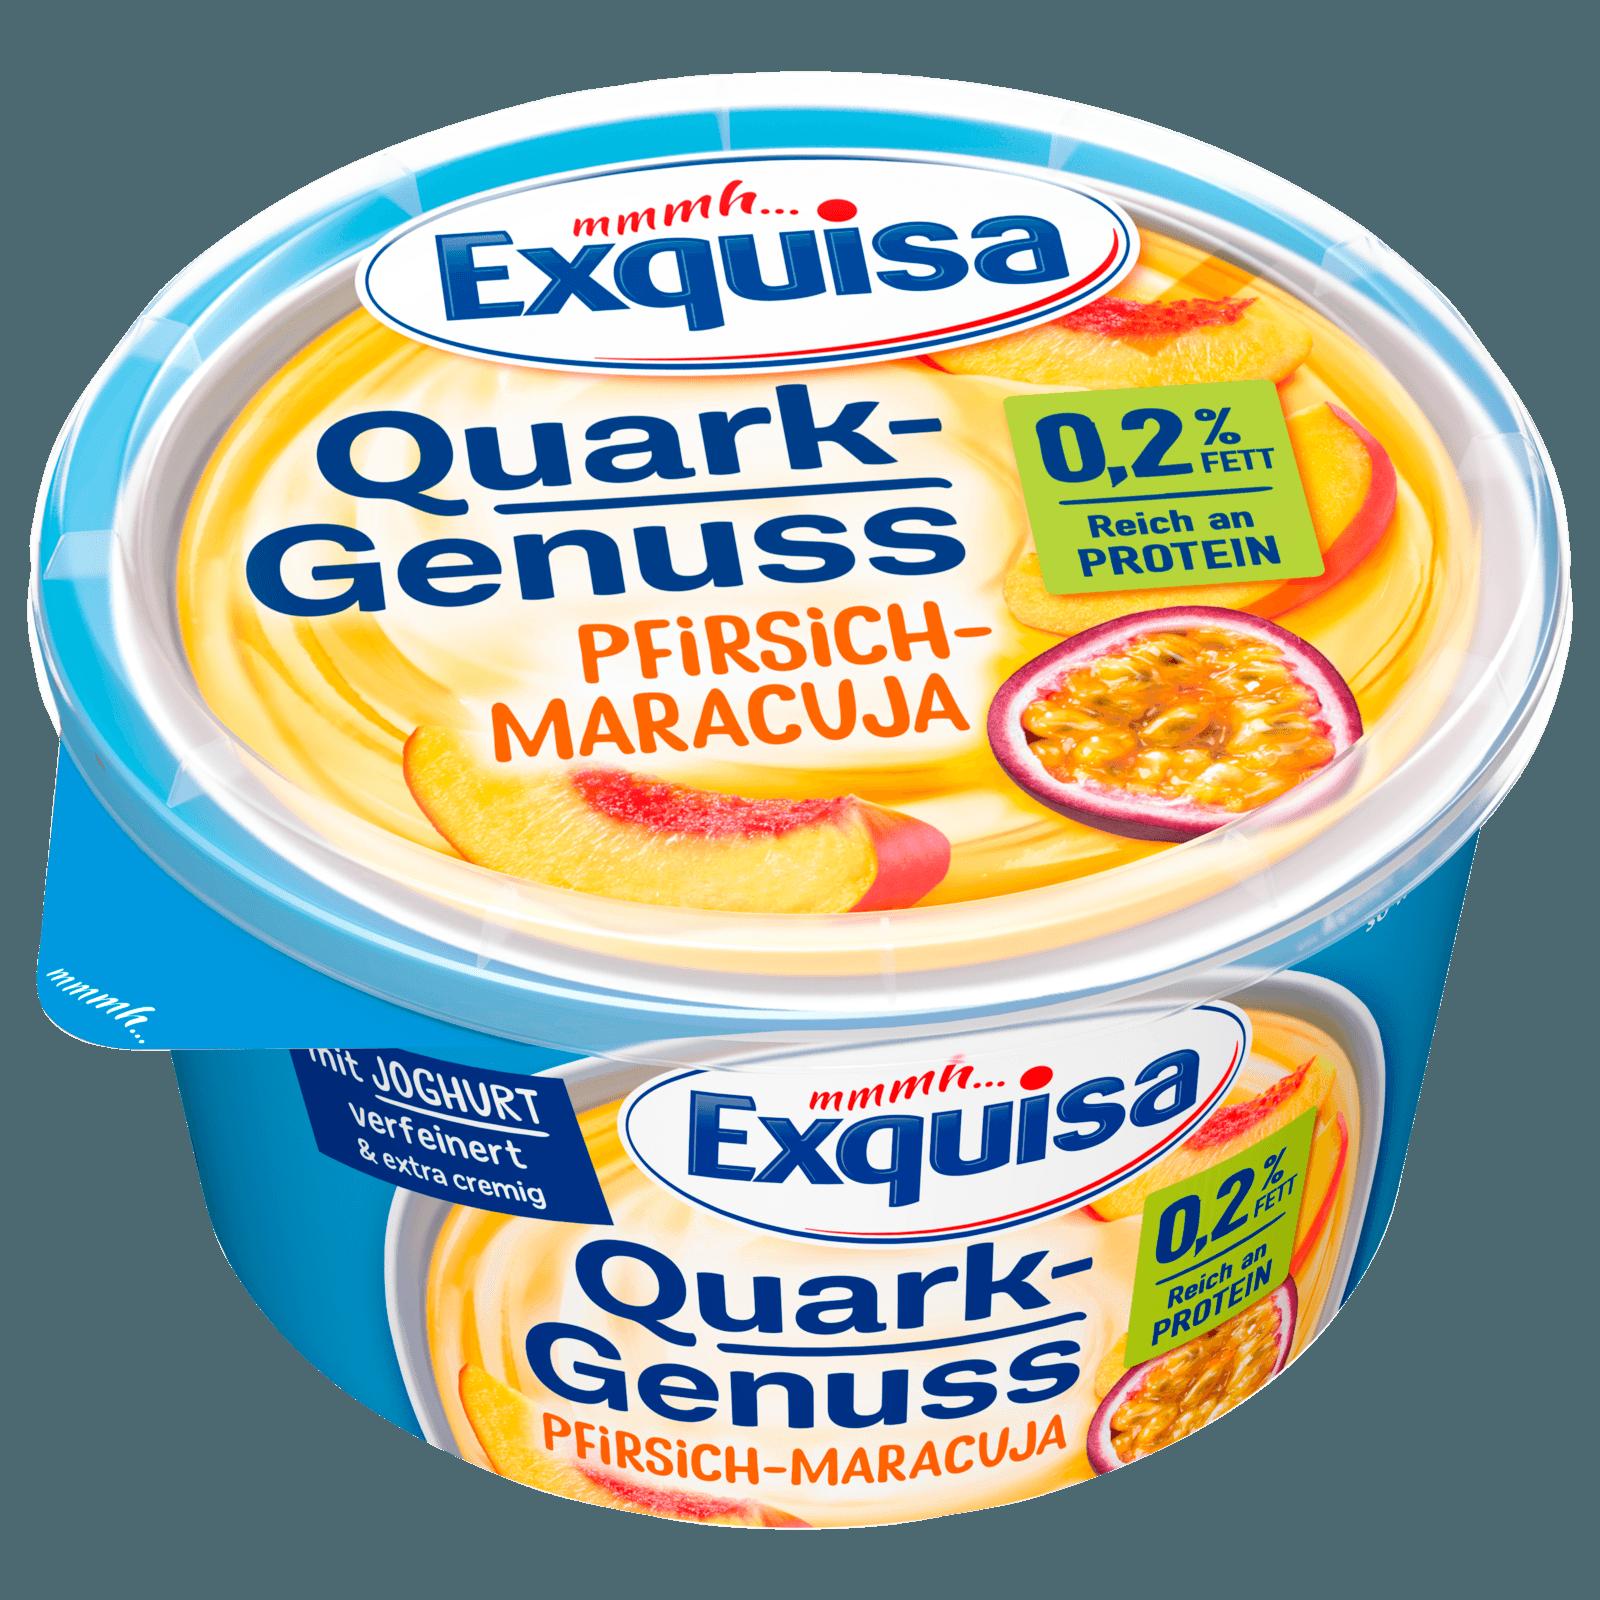 Exquisa QuarkGenuss Pfirsich & Maracuja 0,2% 500g